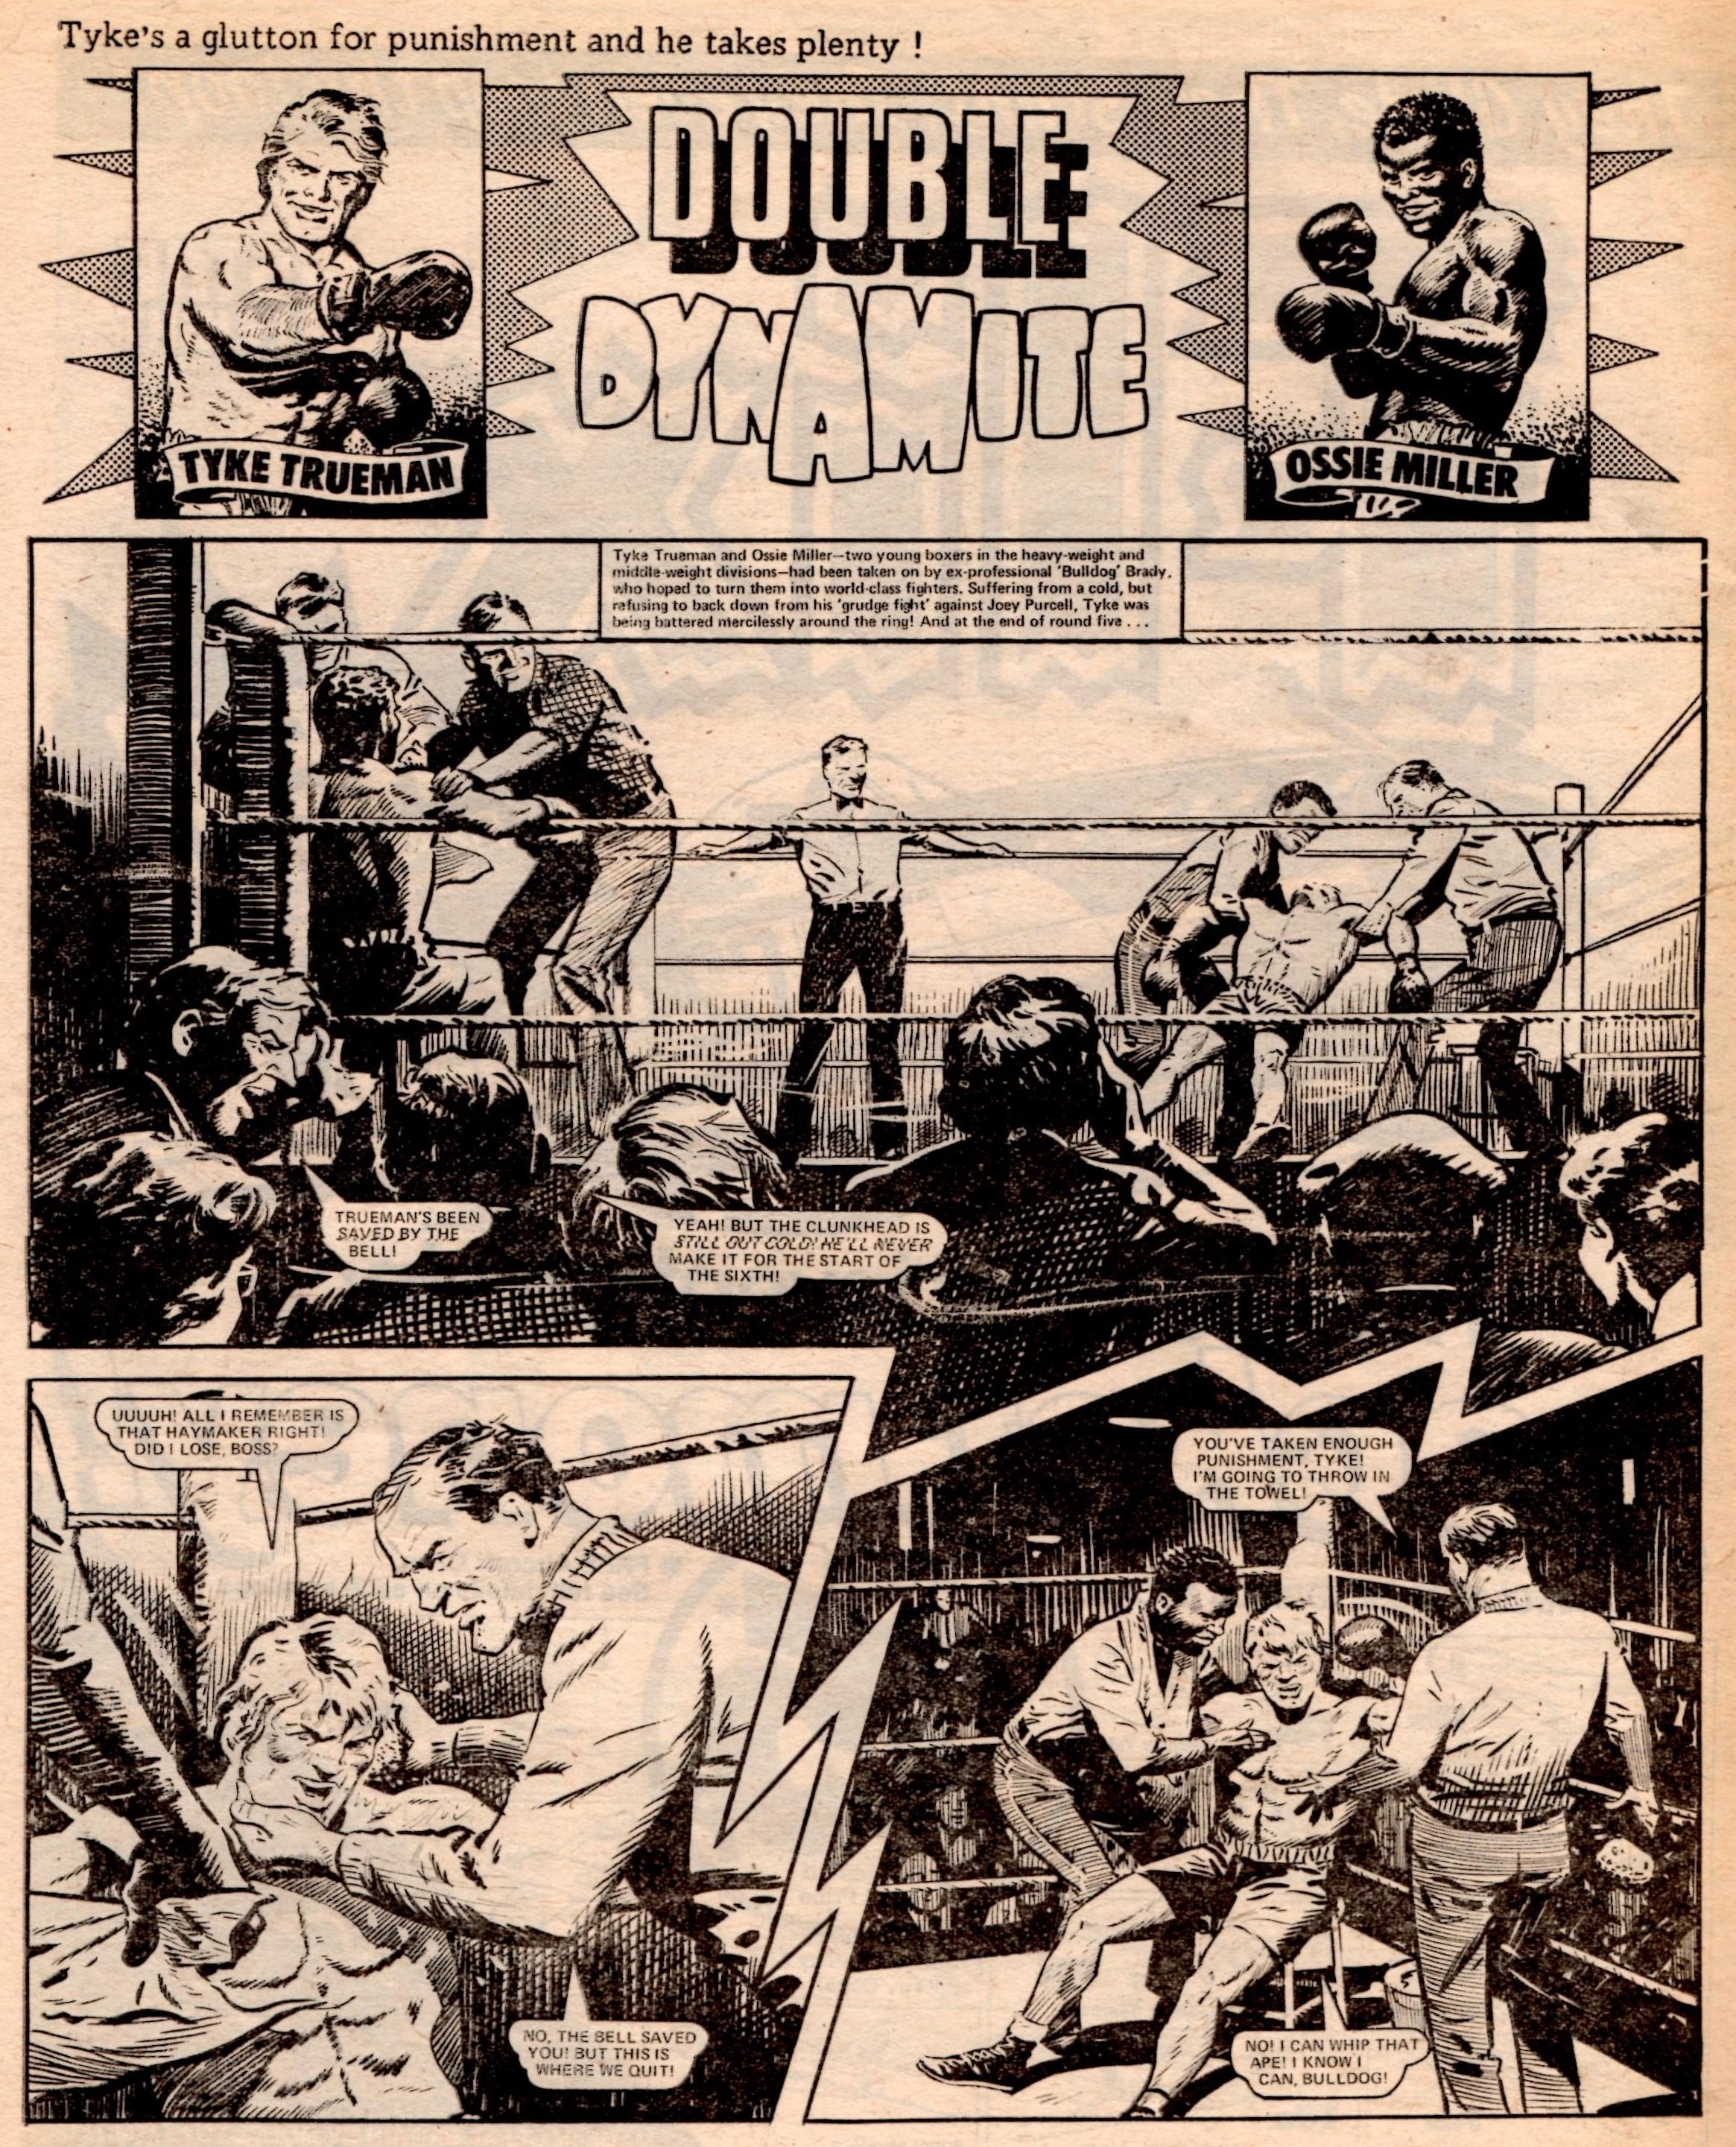 Double Dynamite: Scott Goodall (writer), Felix Carrion (artist)